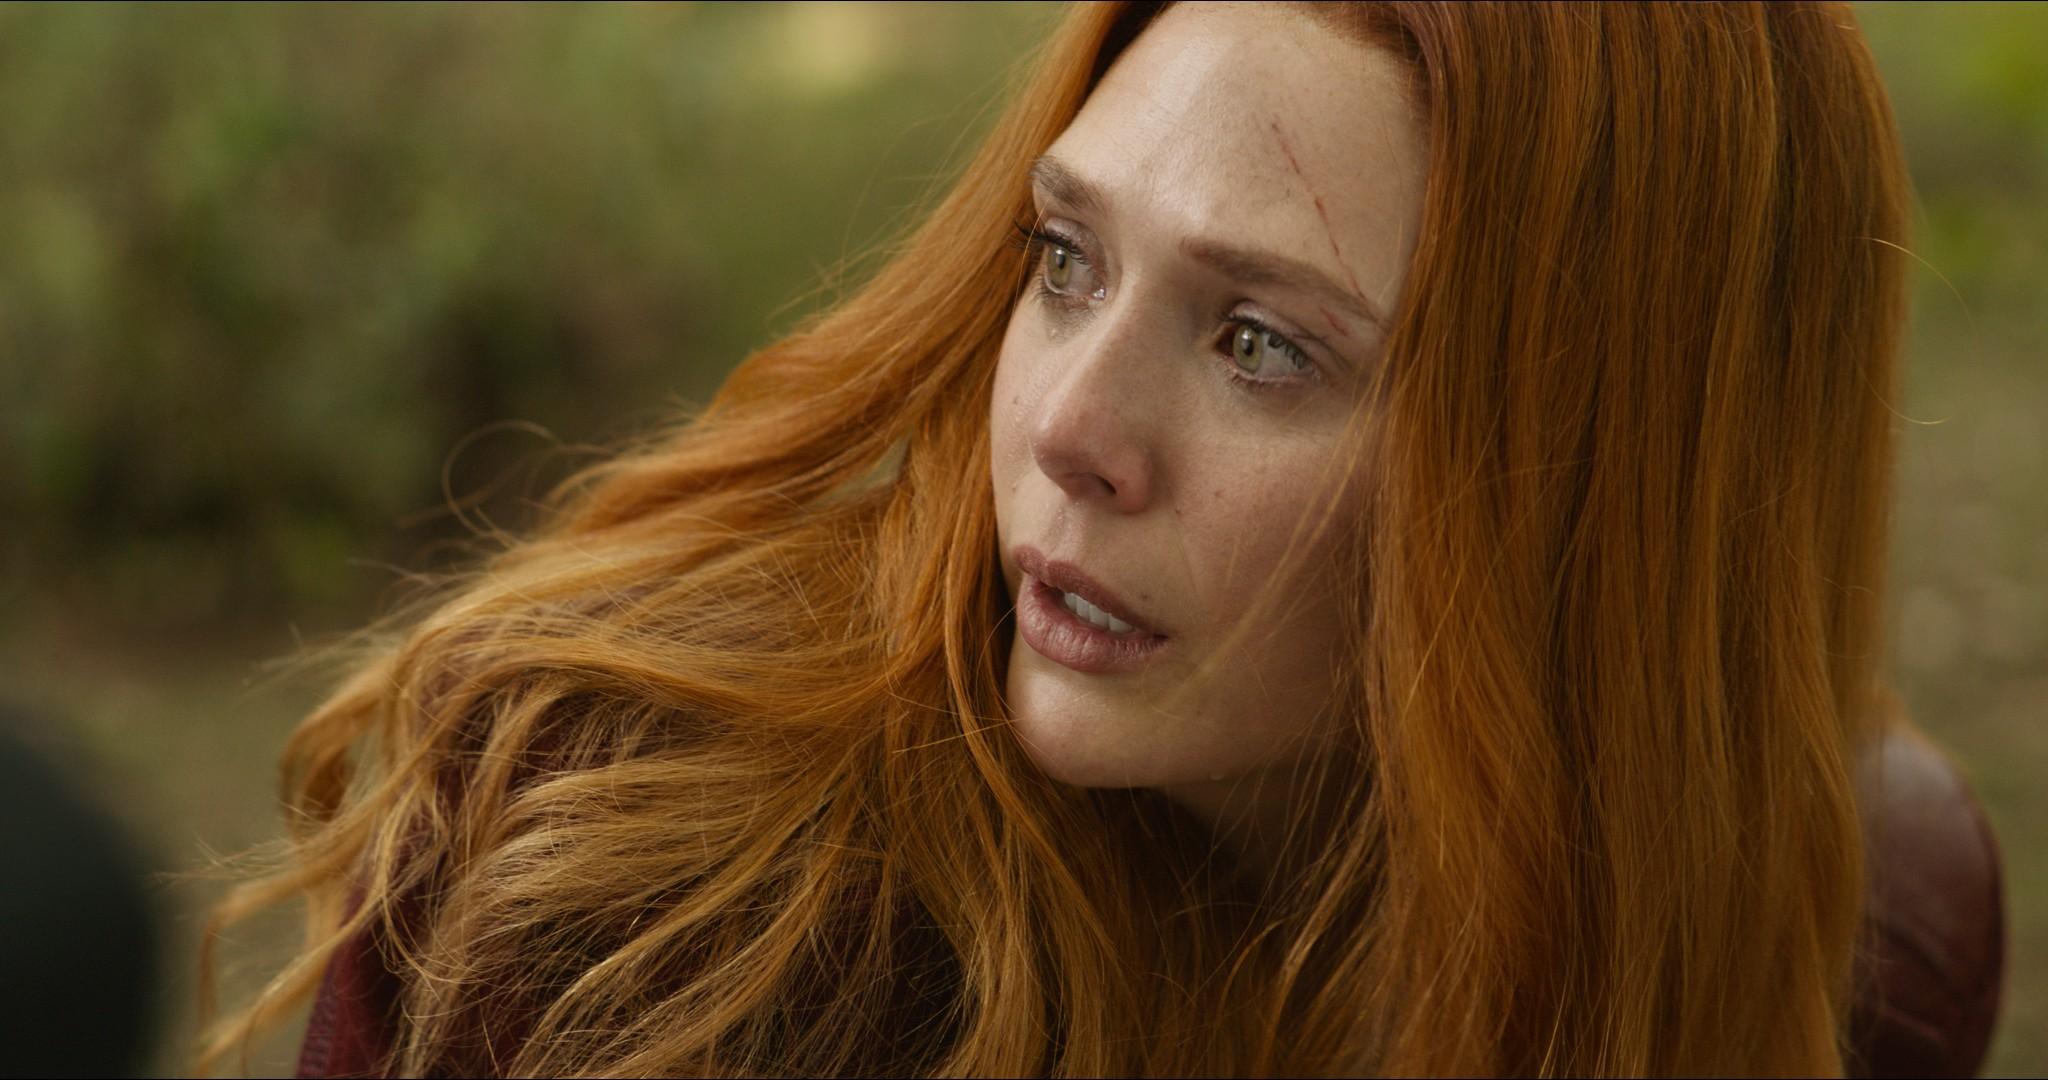 Scarlet Witch/Wanda Maximoff (Elizabeth Olsen)